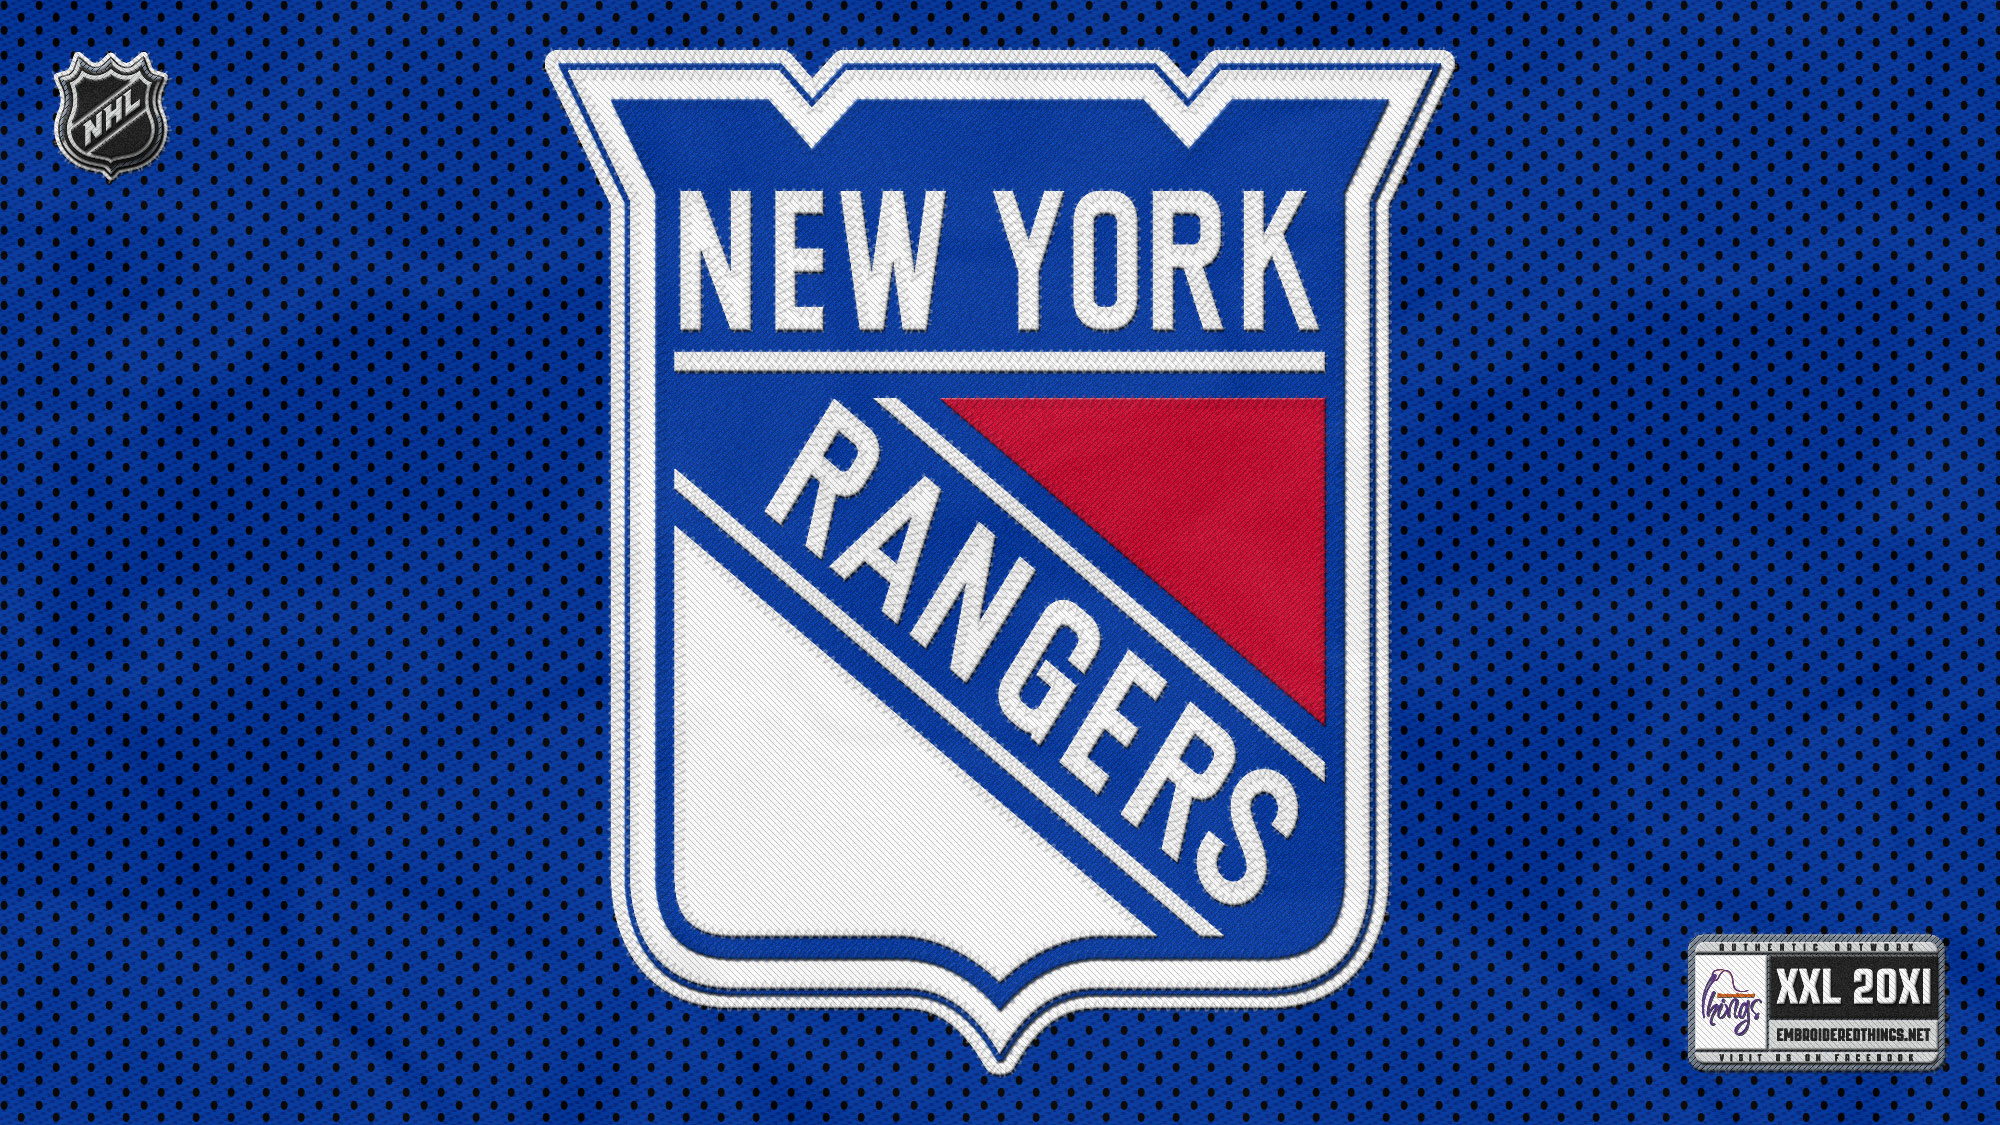 New York Rangers wallpapers New York Rangers background 2000x1125